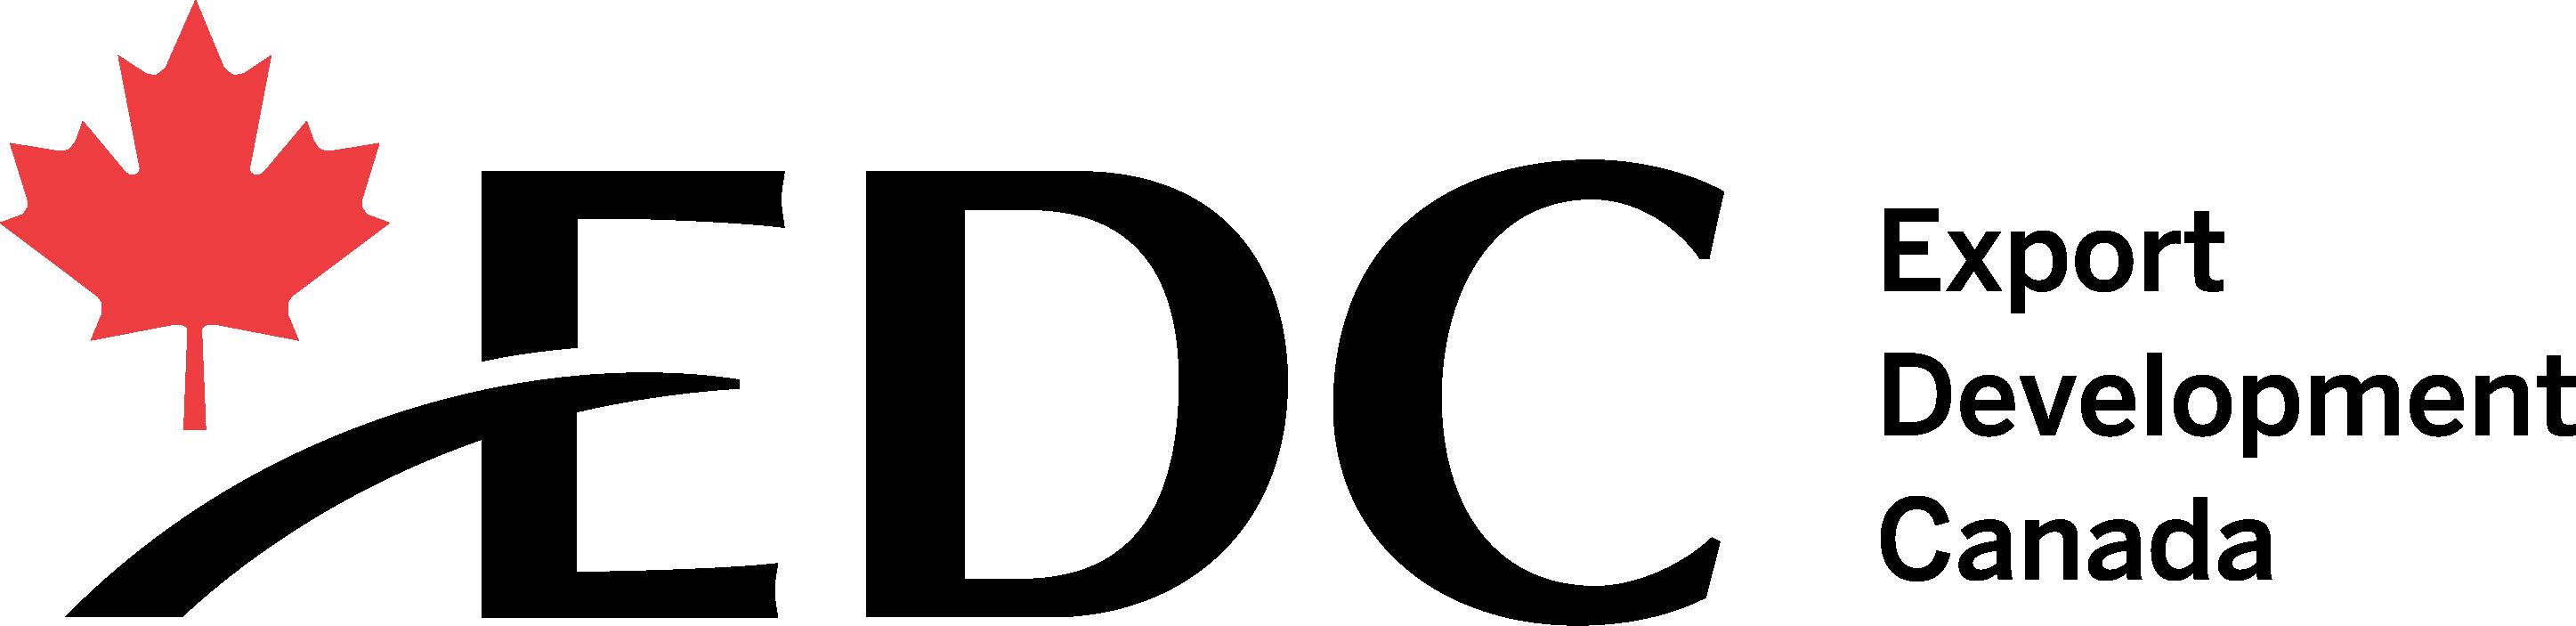 Export Development Canada Logo